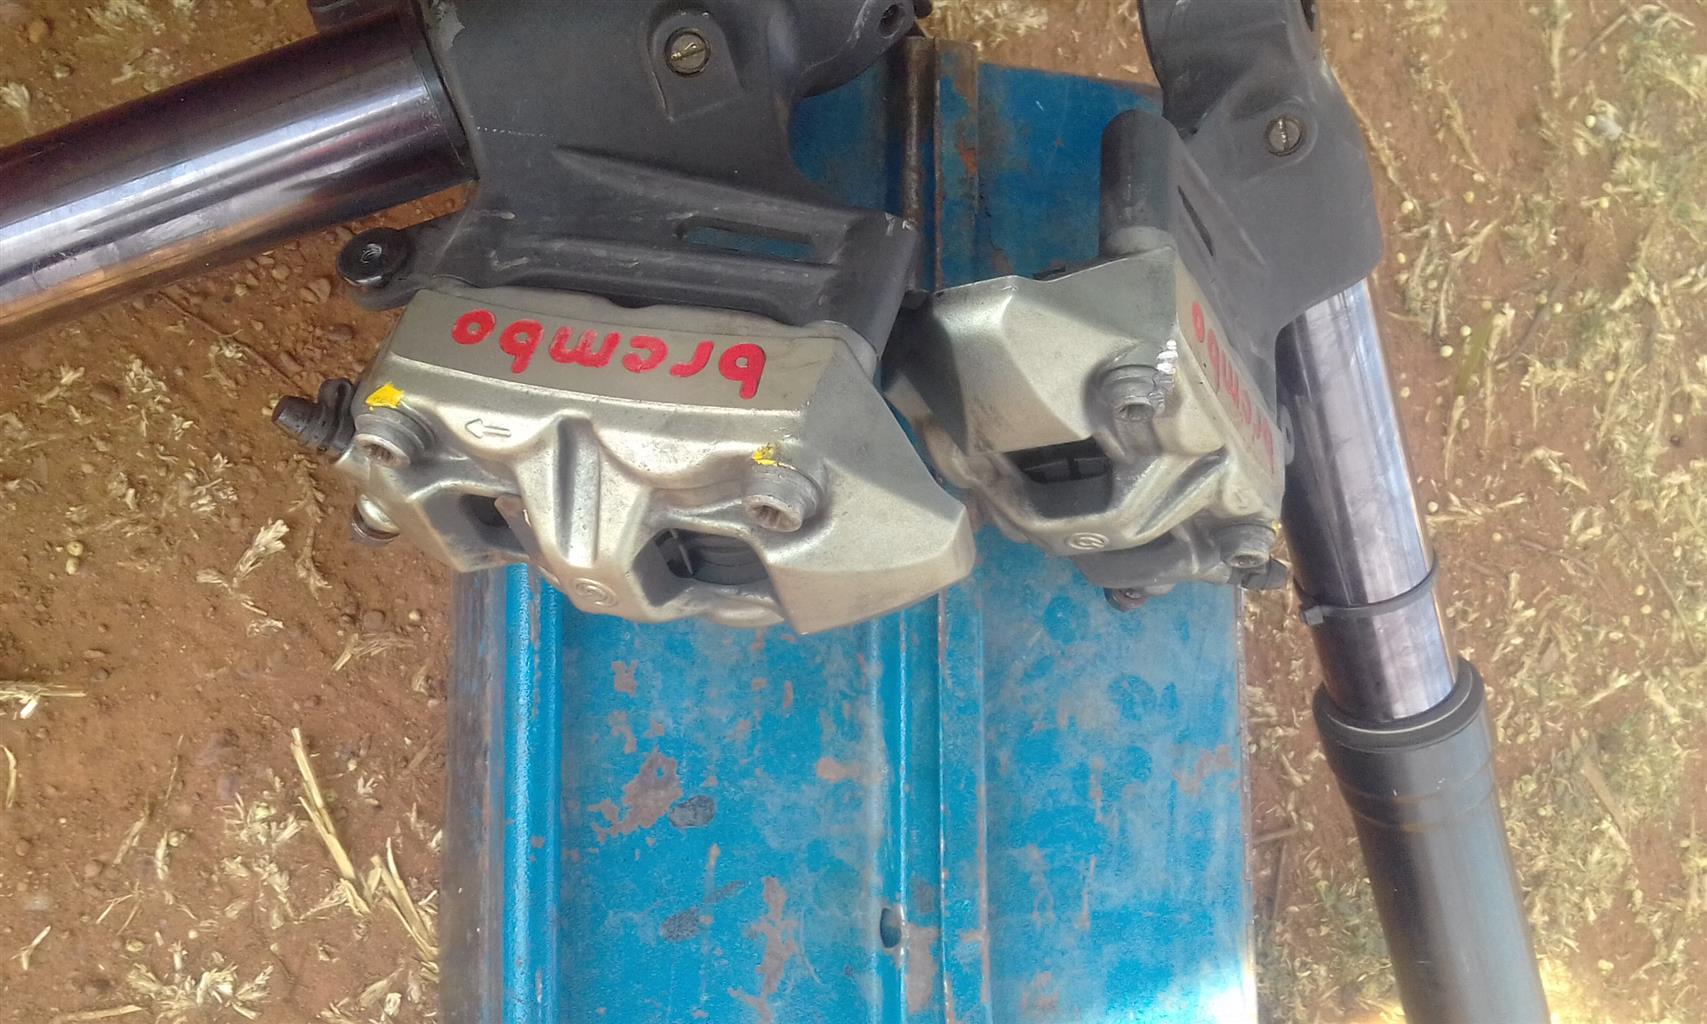 Ktm 990 Brake calipers x 2 for sale